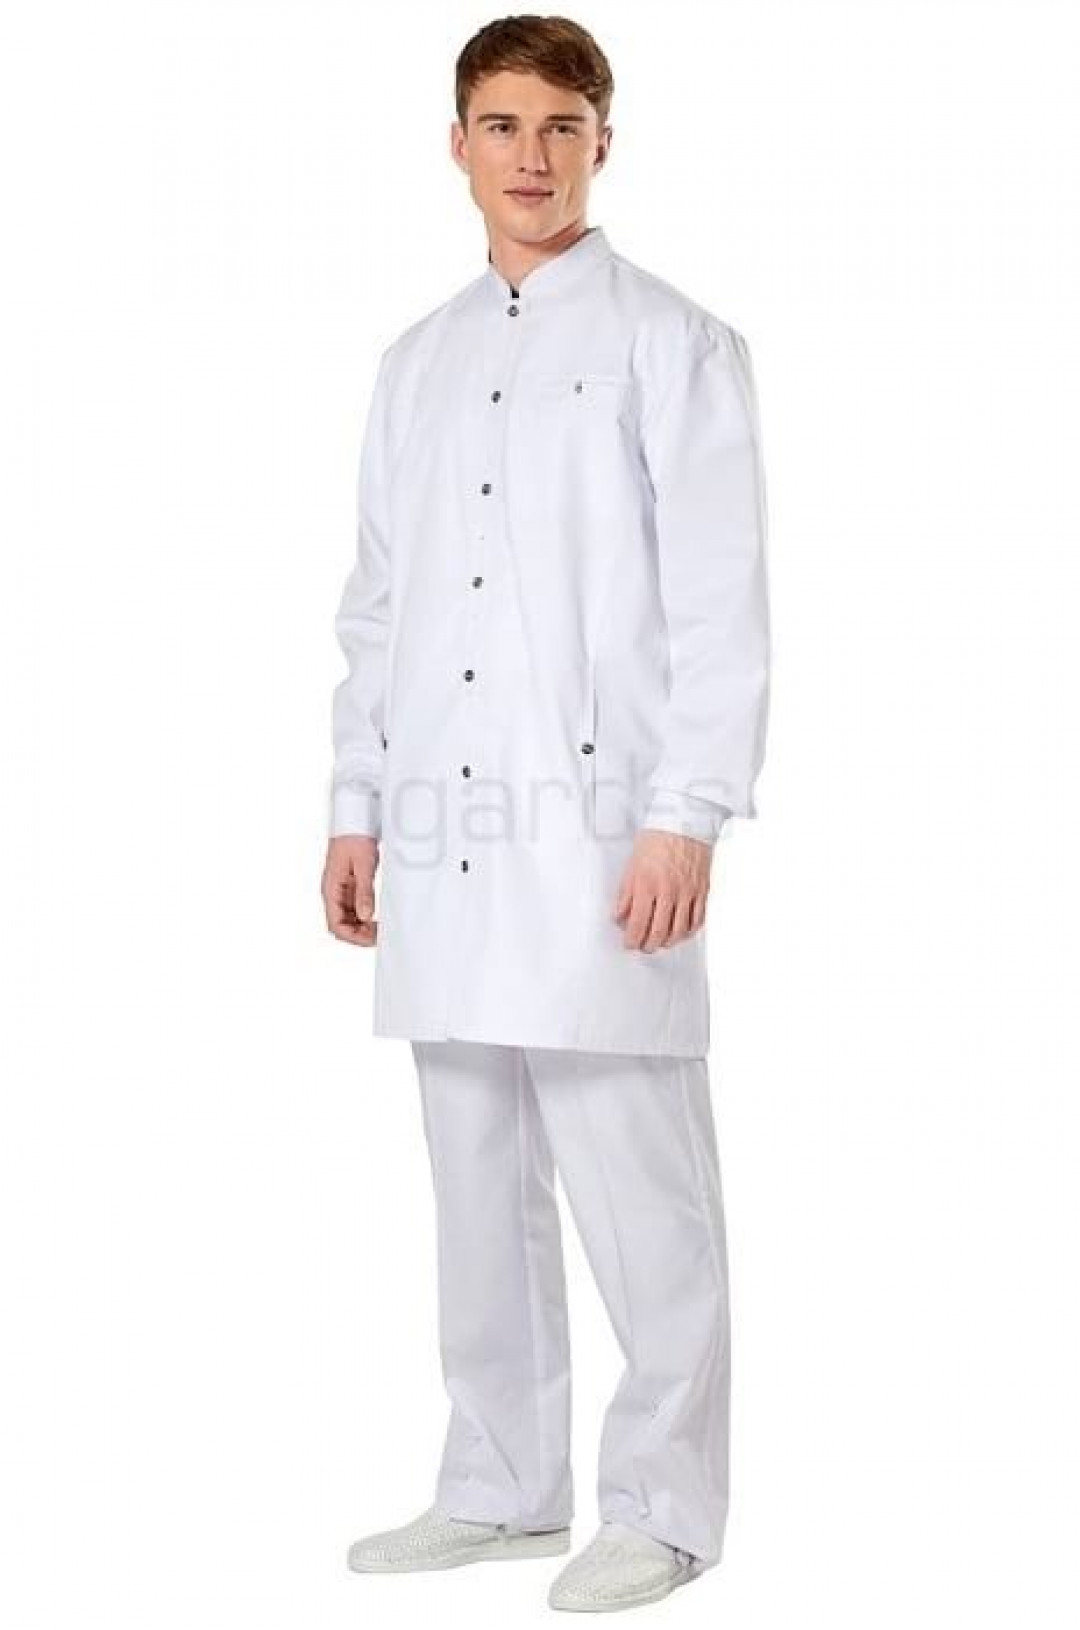 Халат медицинский мужской ЭКСПЕРТ (белый, тиси)